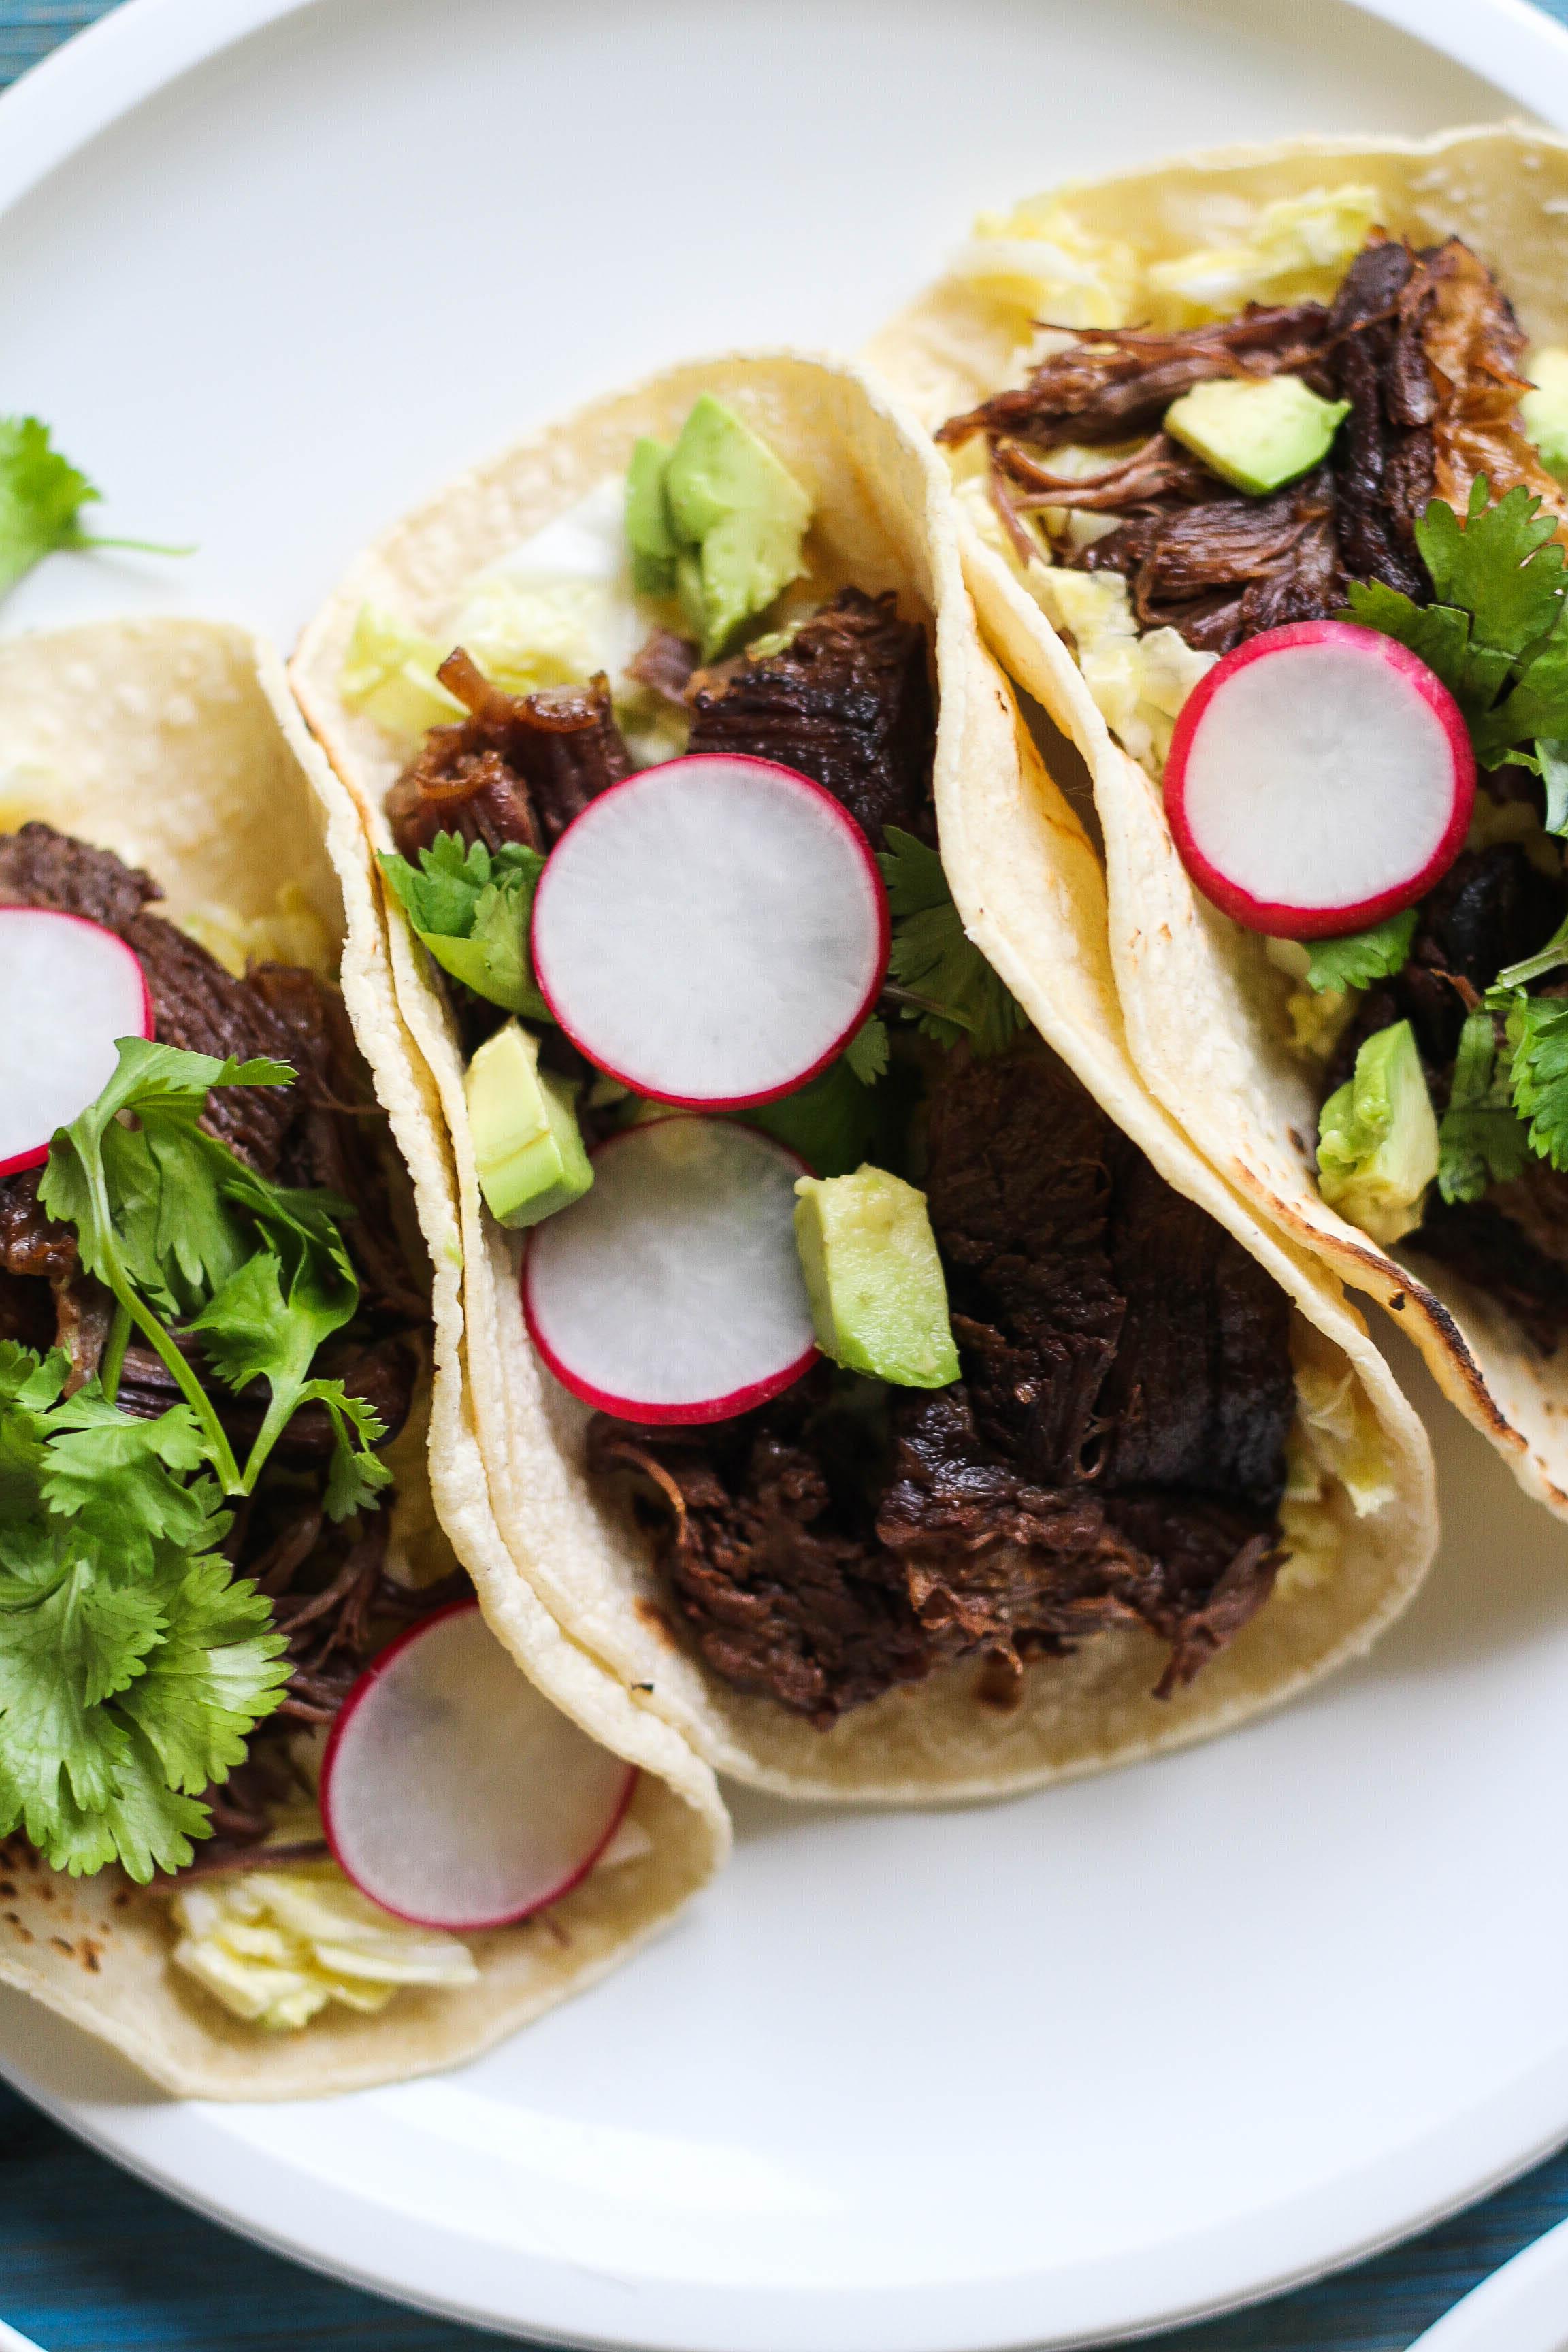 Braised Beef Short Rib Tacos